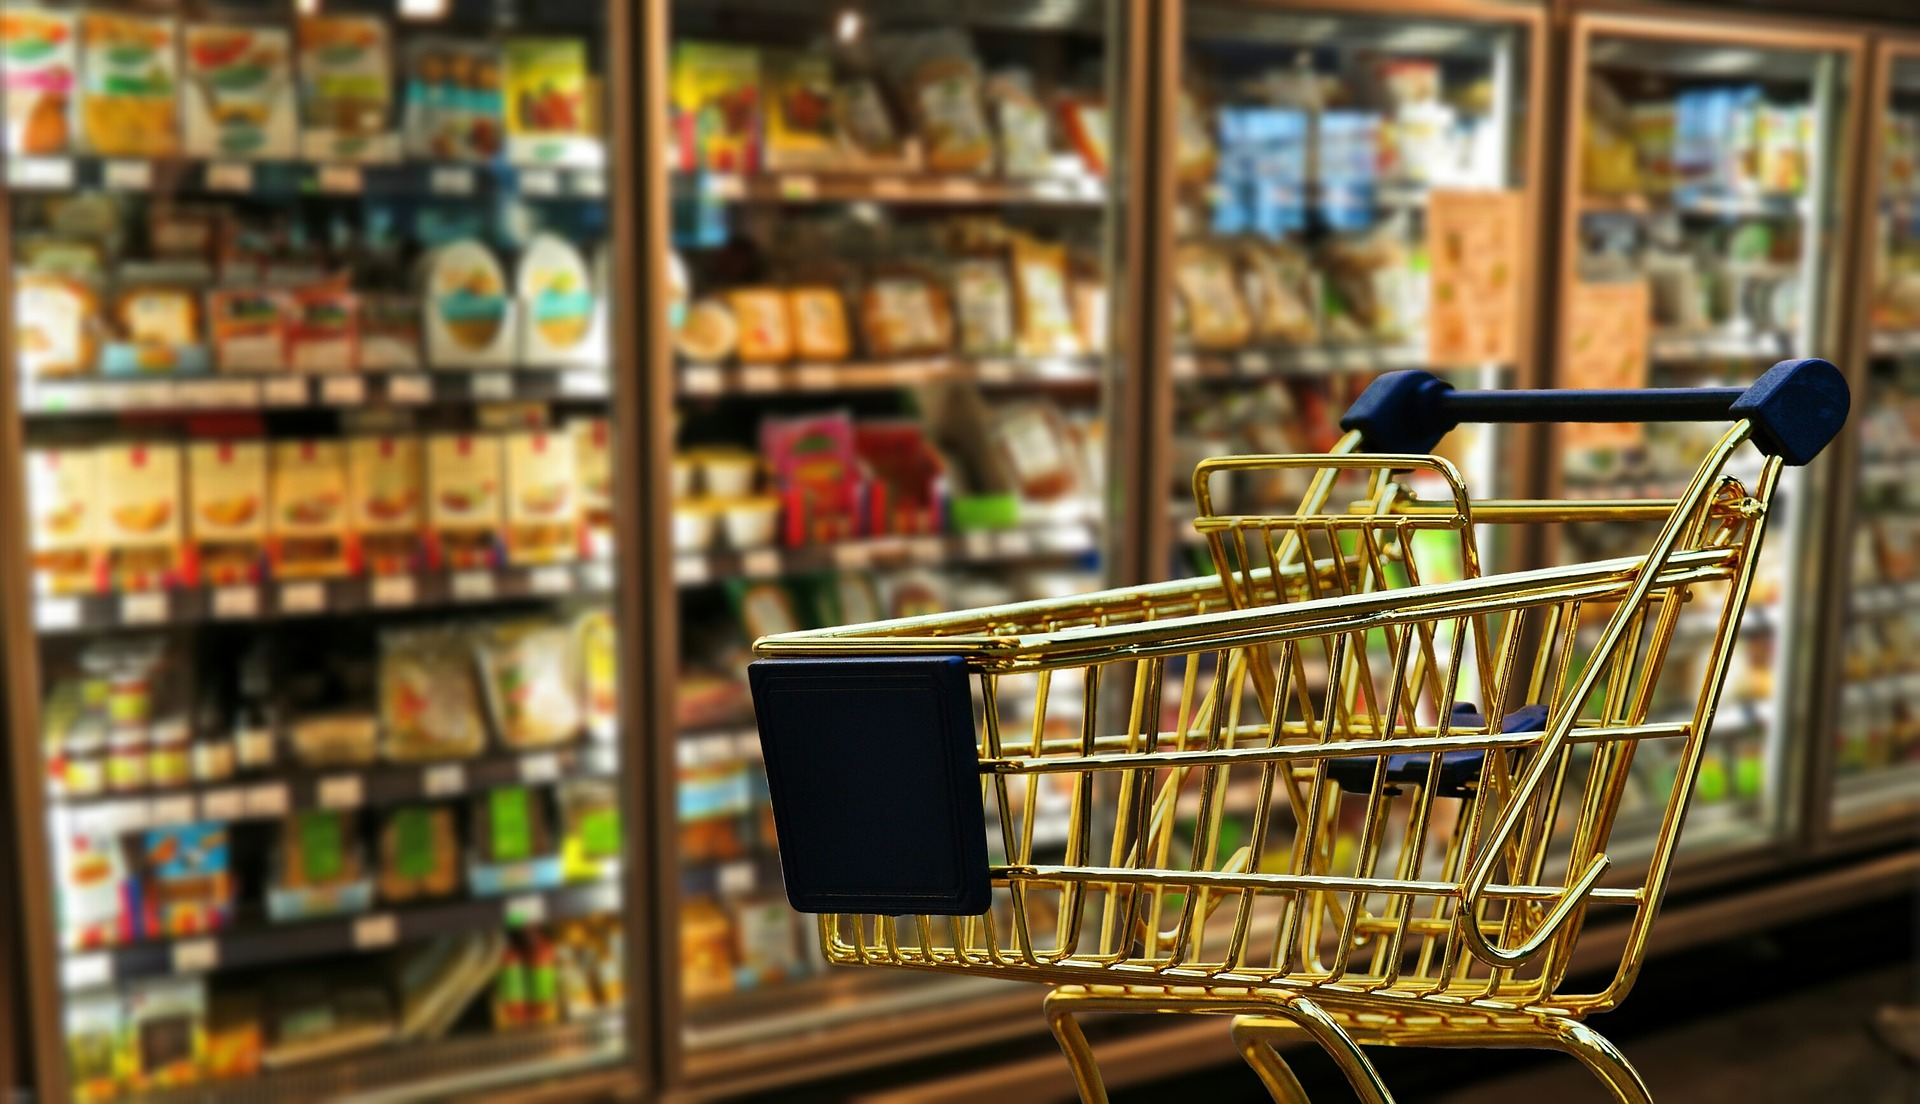 shopping-1165437_1920